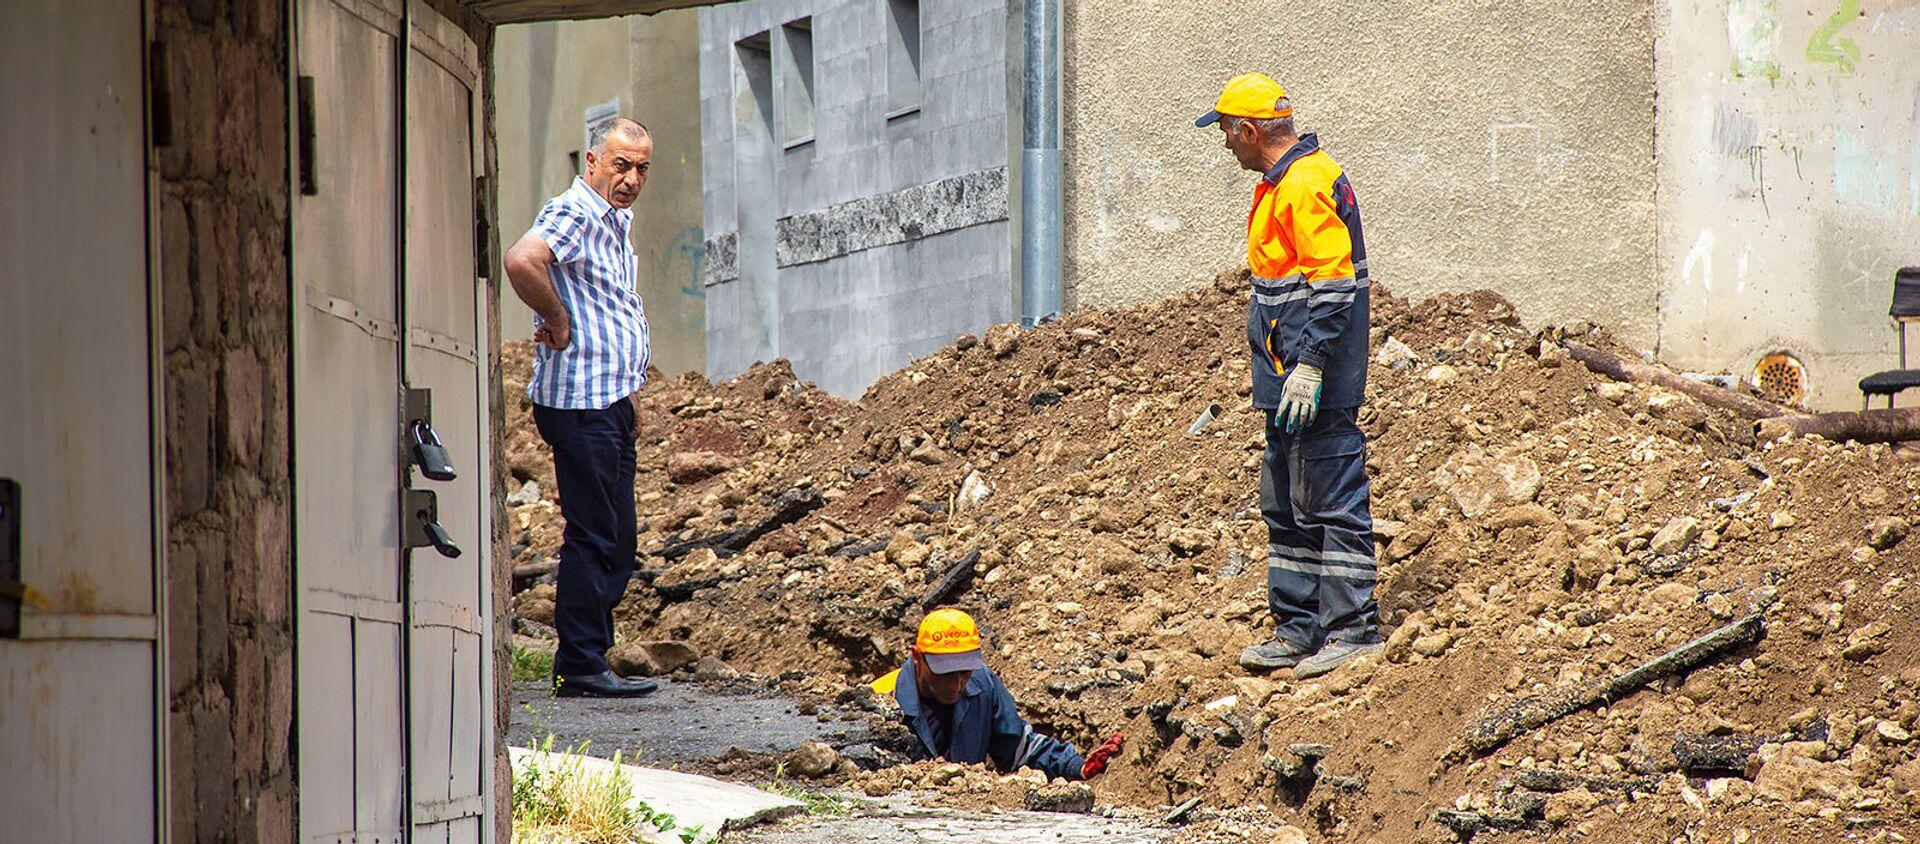 Неисправная канализация в Нор Норке - Sputnik Армения, 1920, 07.06.2021